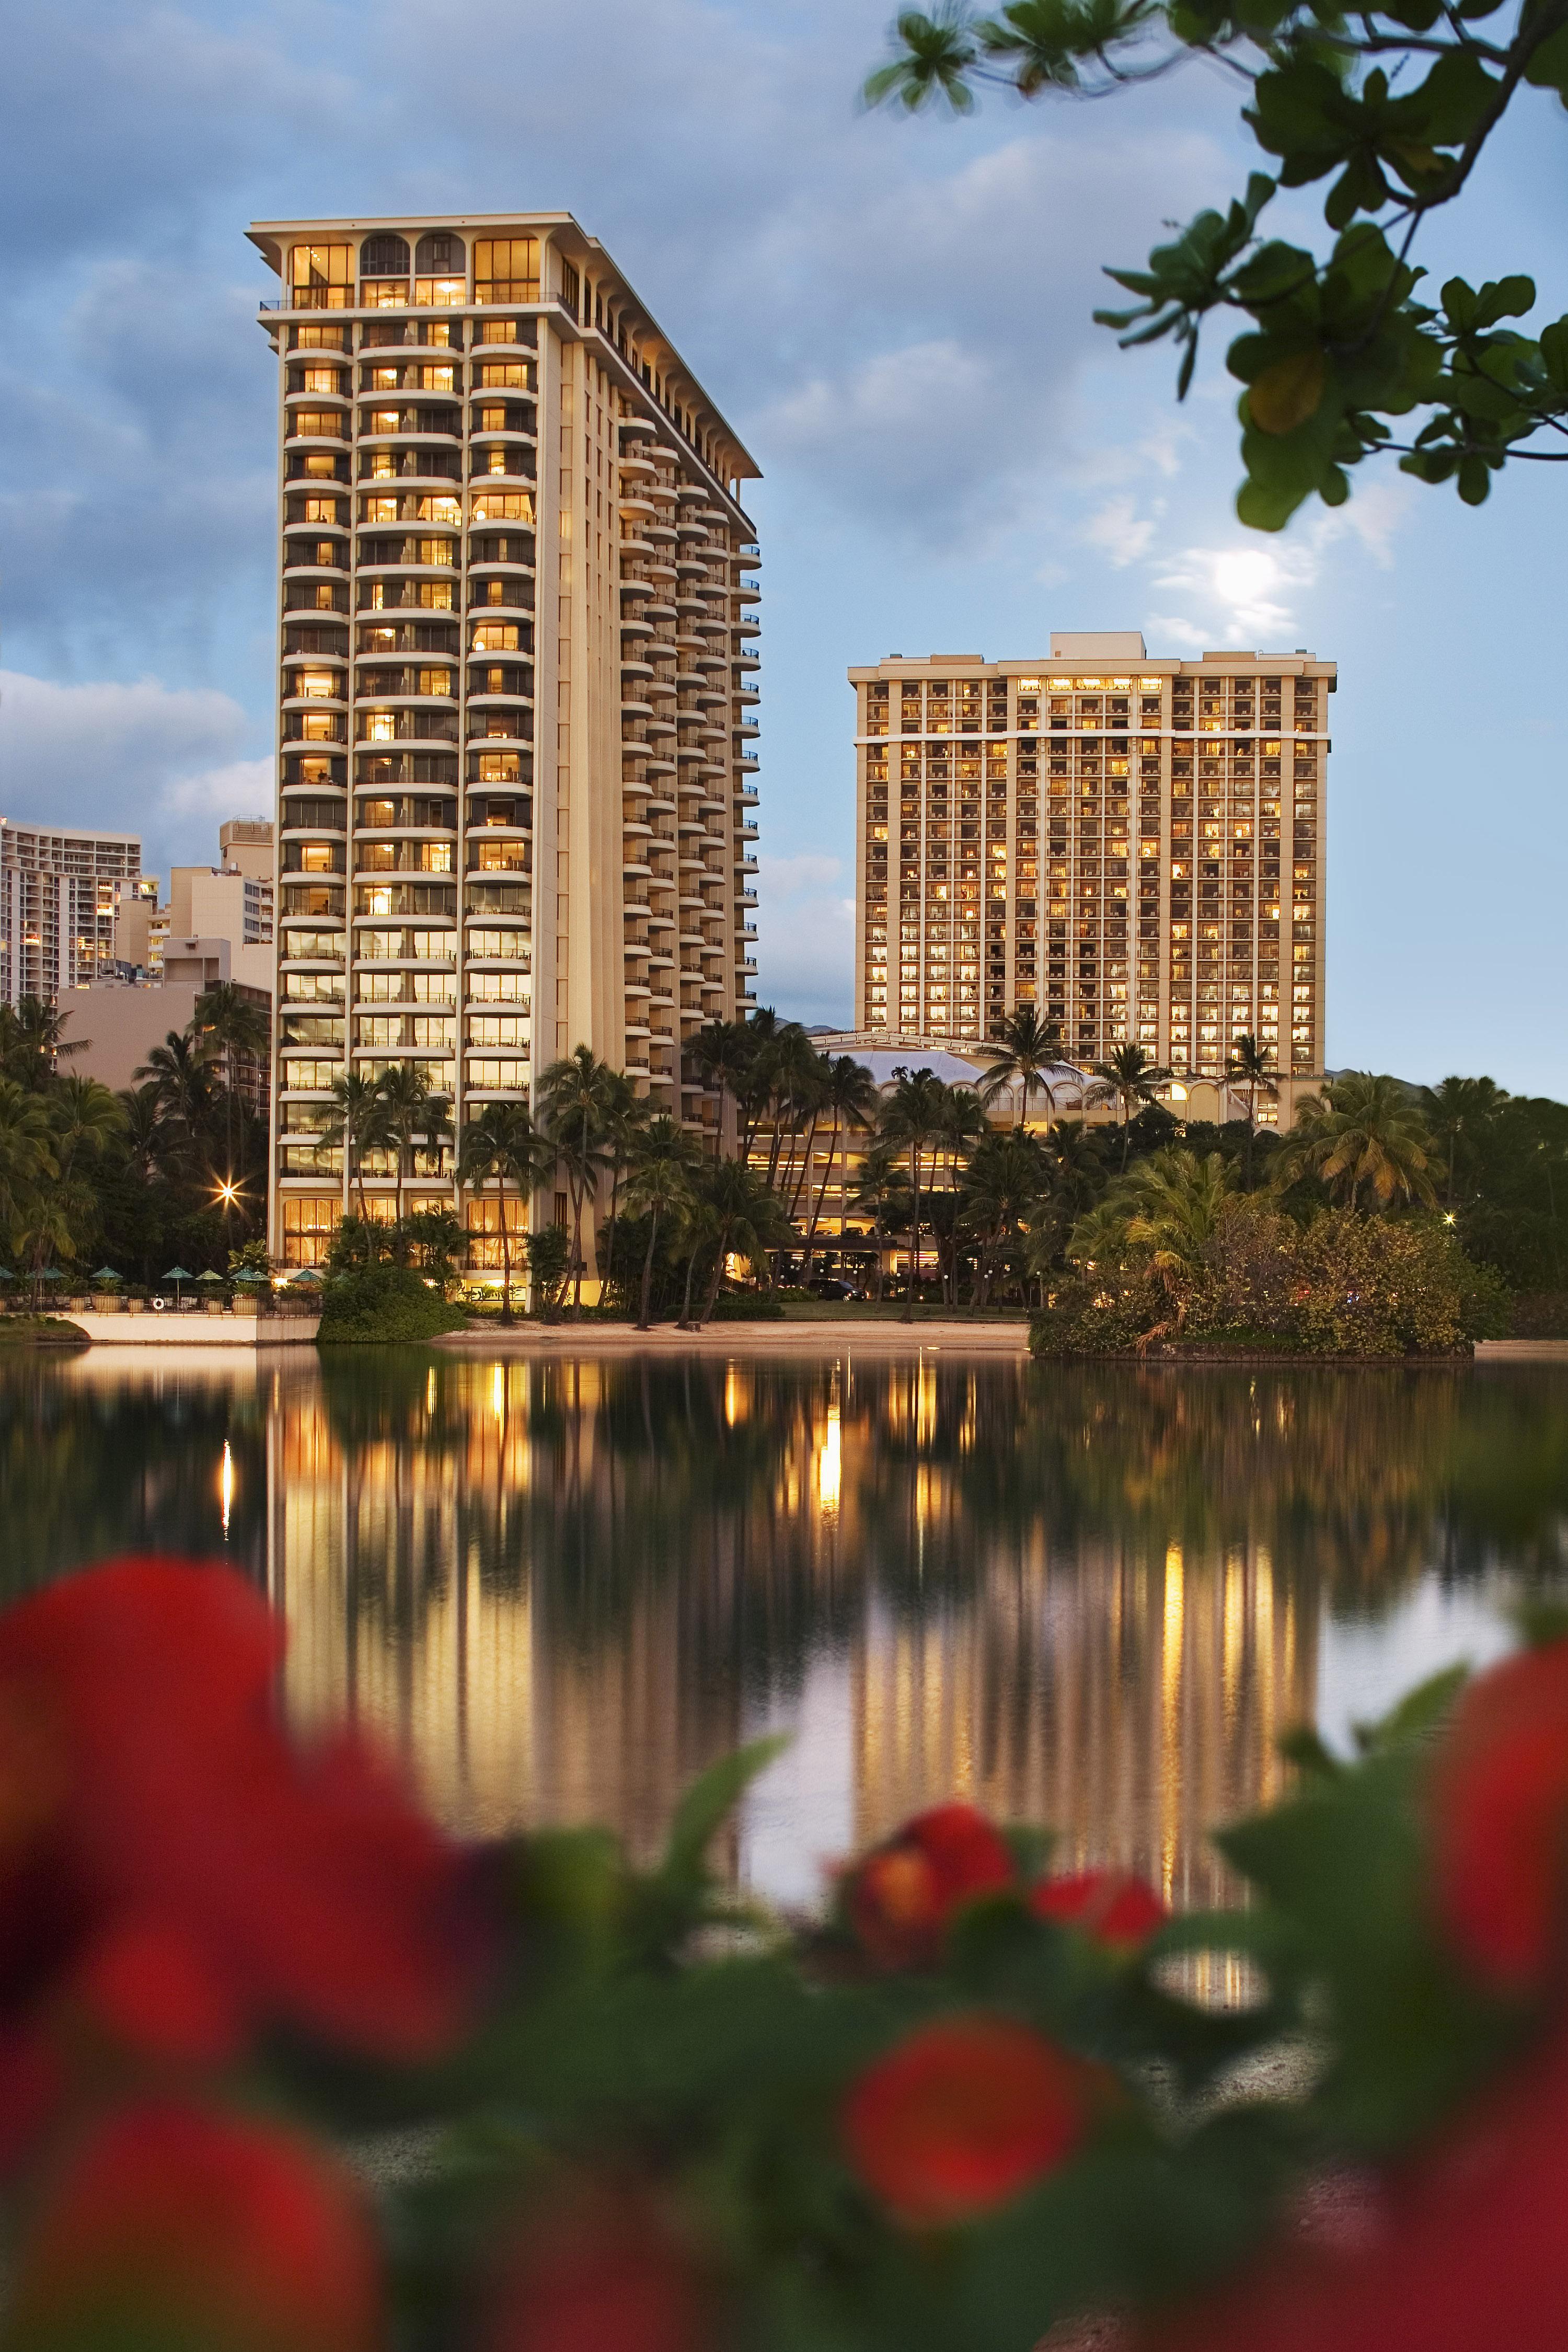 Hilton Grand Vacations Suites at Hilton Hawaiian Village